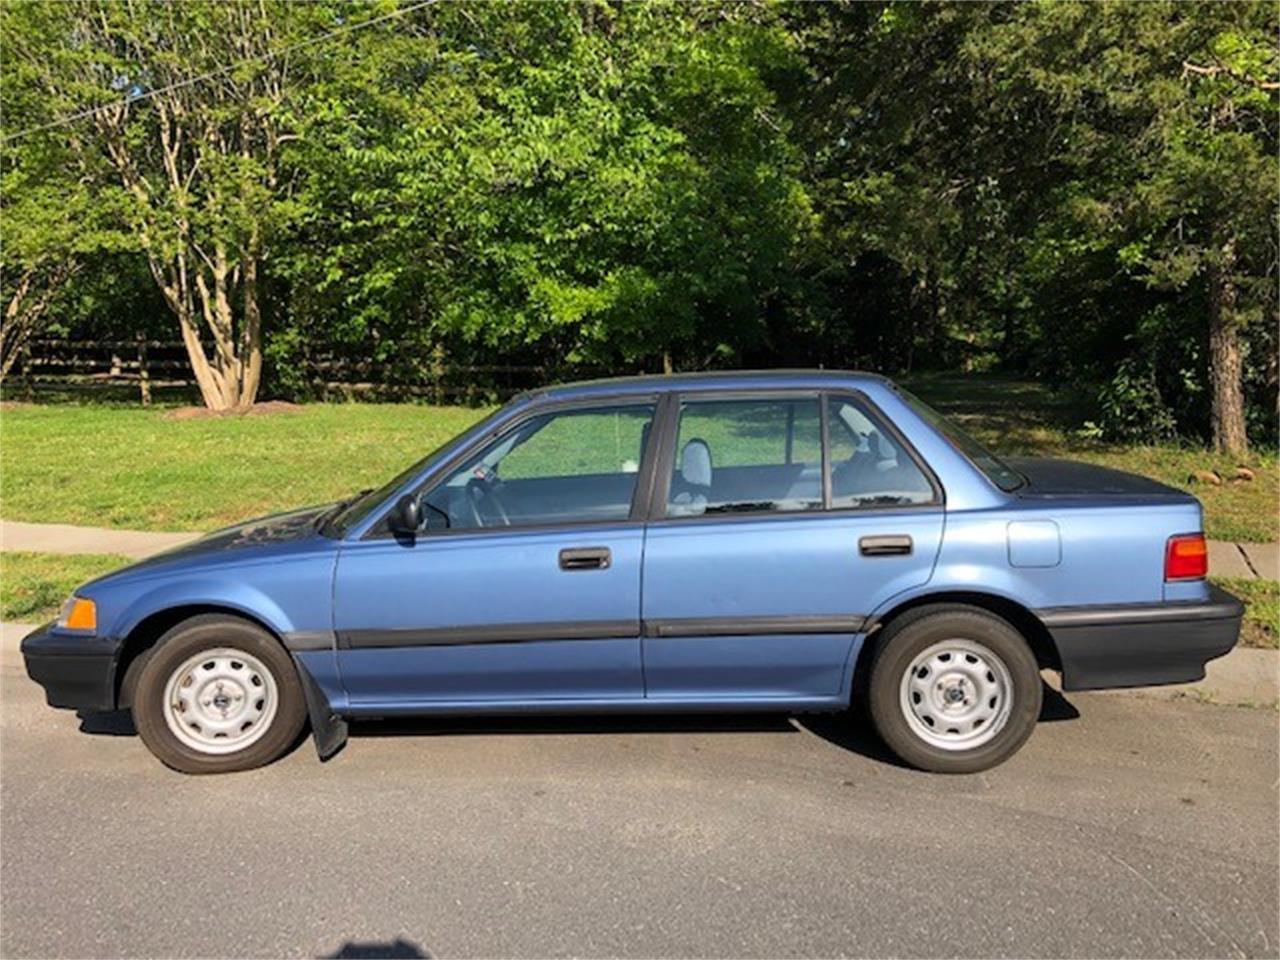 for sale 1991 honda civic in charlotte, north carolina cars - charlotte, nc at geebo